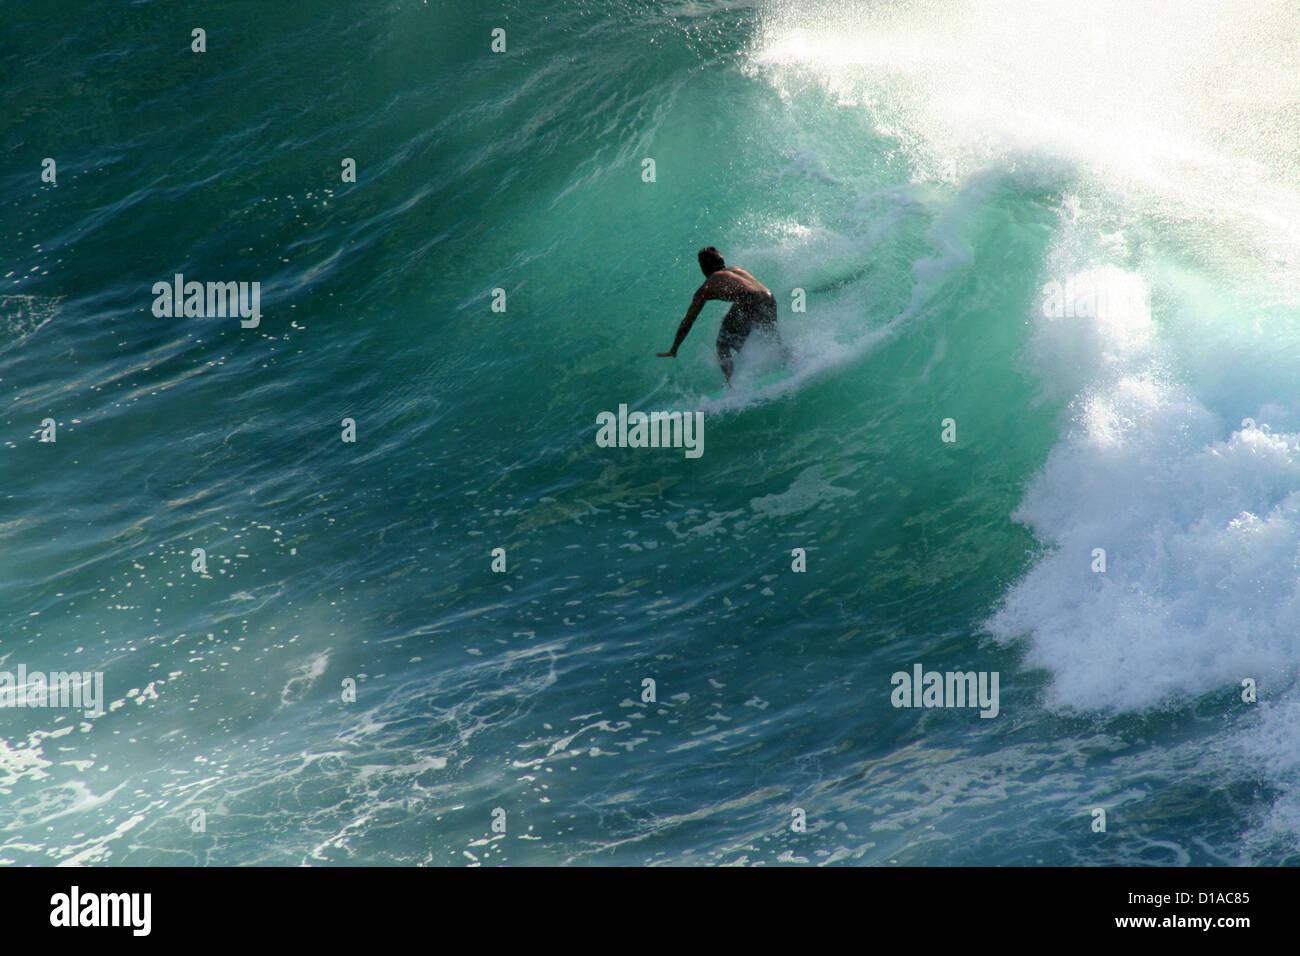 Surfer riding a wave, Maui, Hawaii Stock Photo